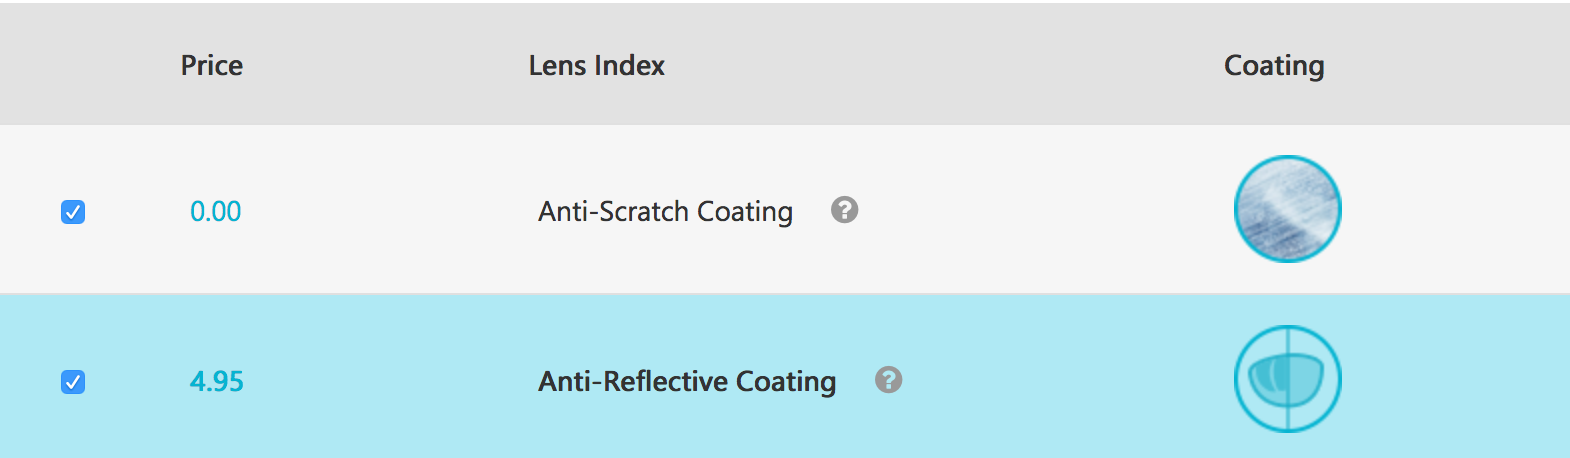 GlassesShop.com Lens coating and anti-reflective coating pricing